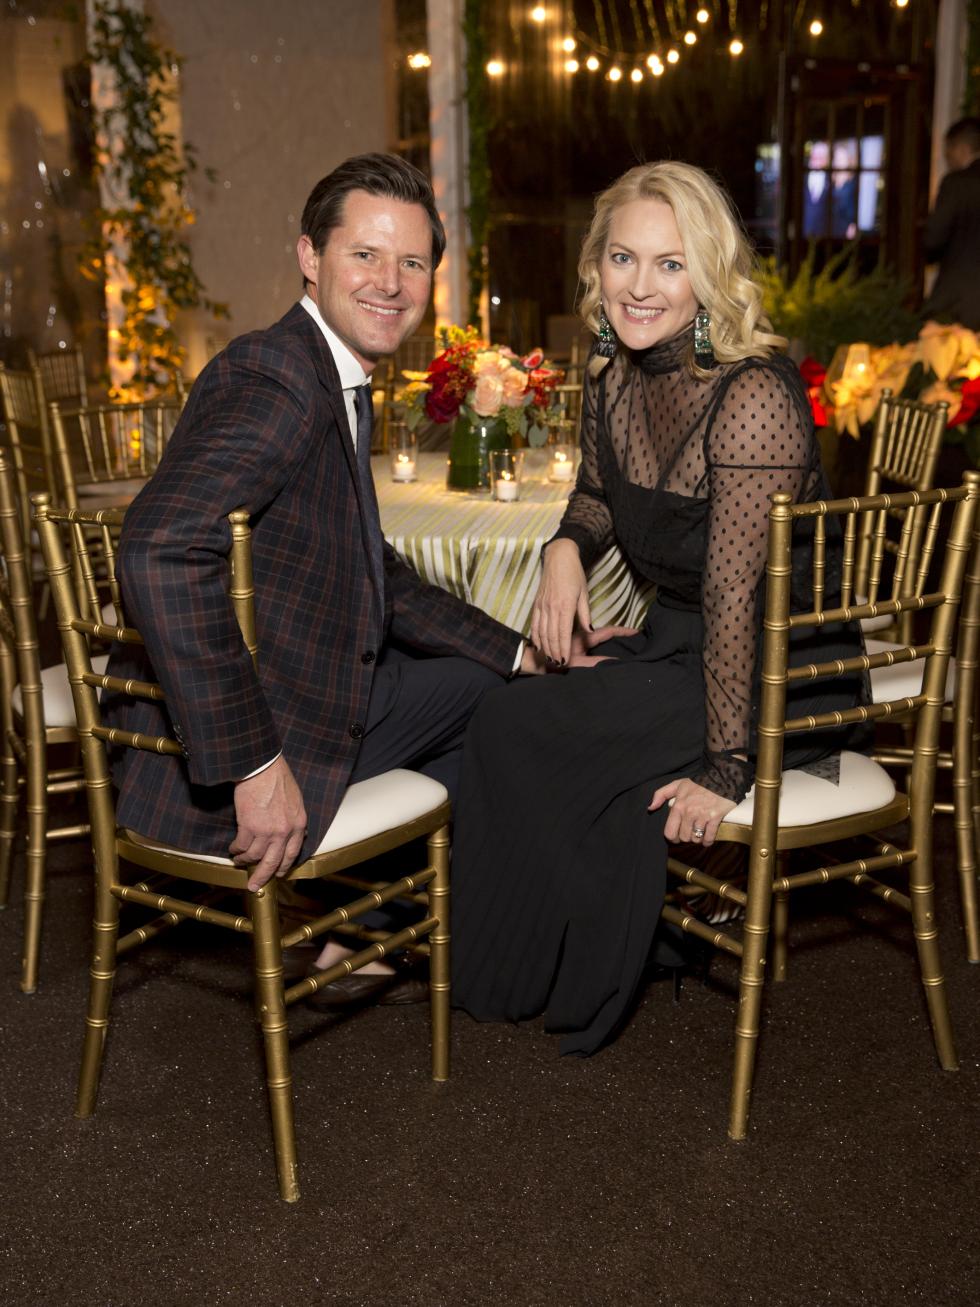 Houston, TCH Ambassadors holiday party, December 2017, Brig Smart, Marcia Smart